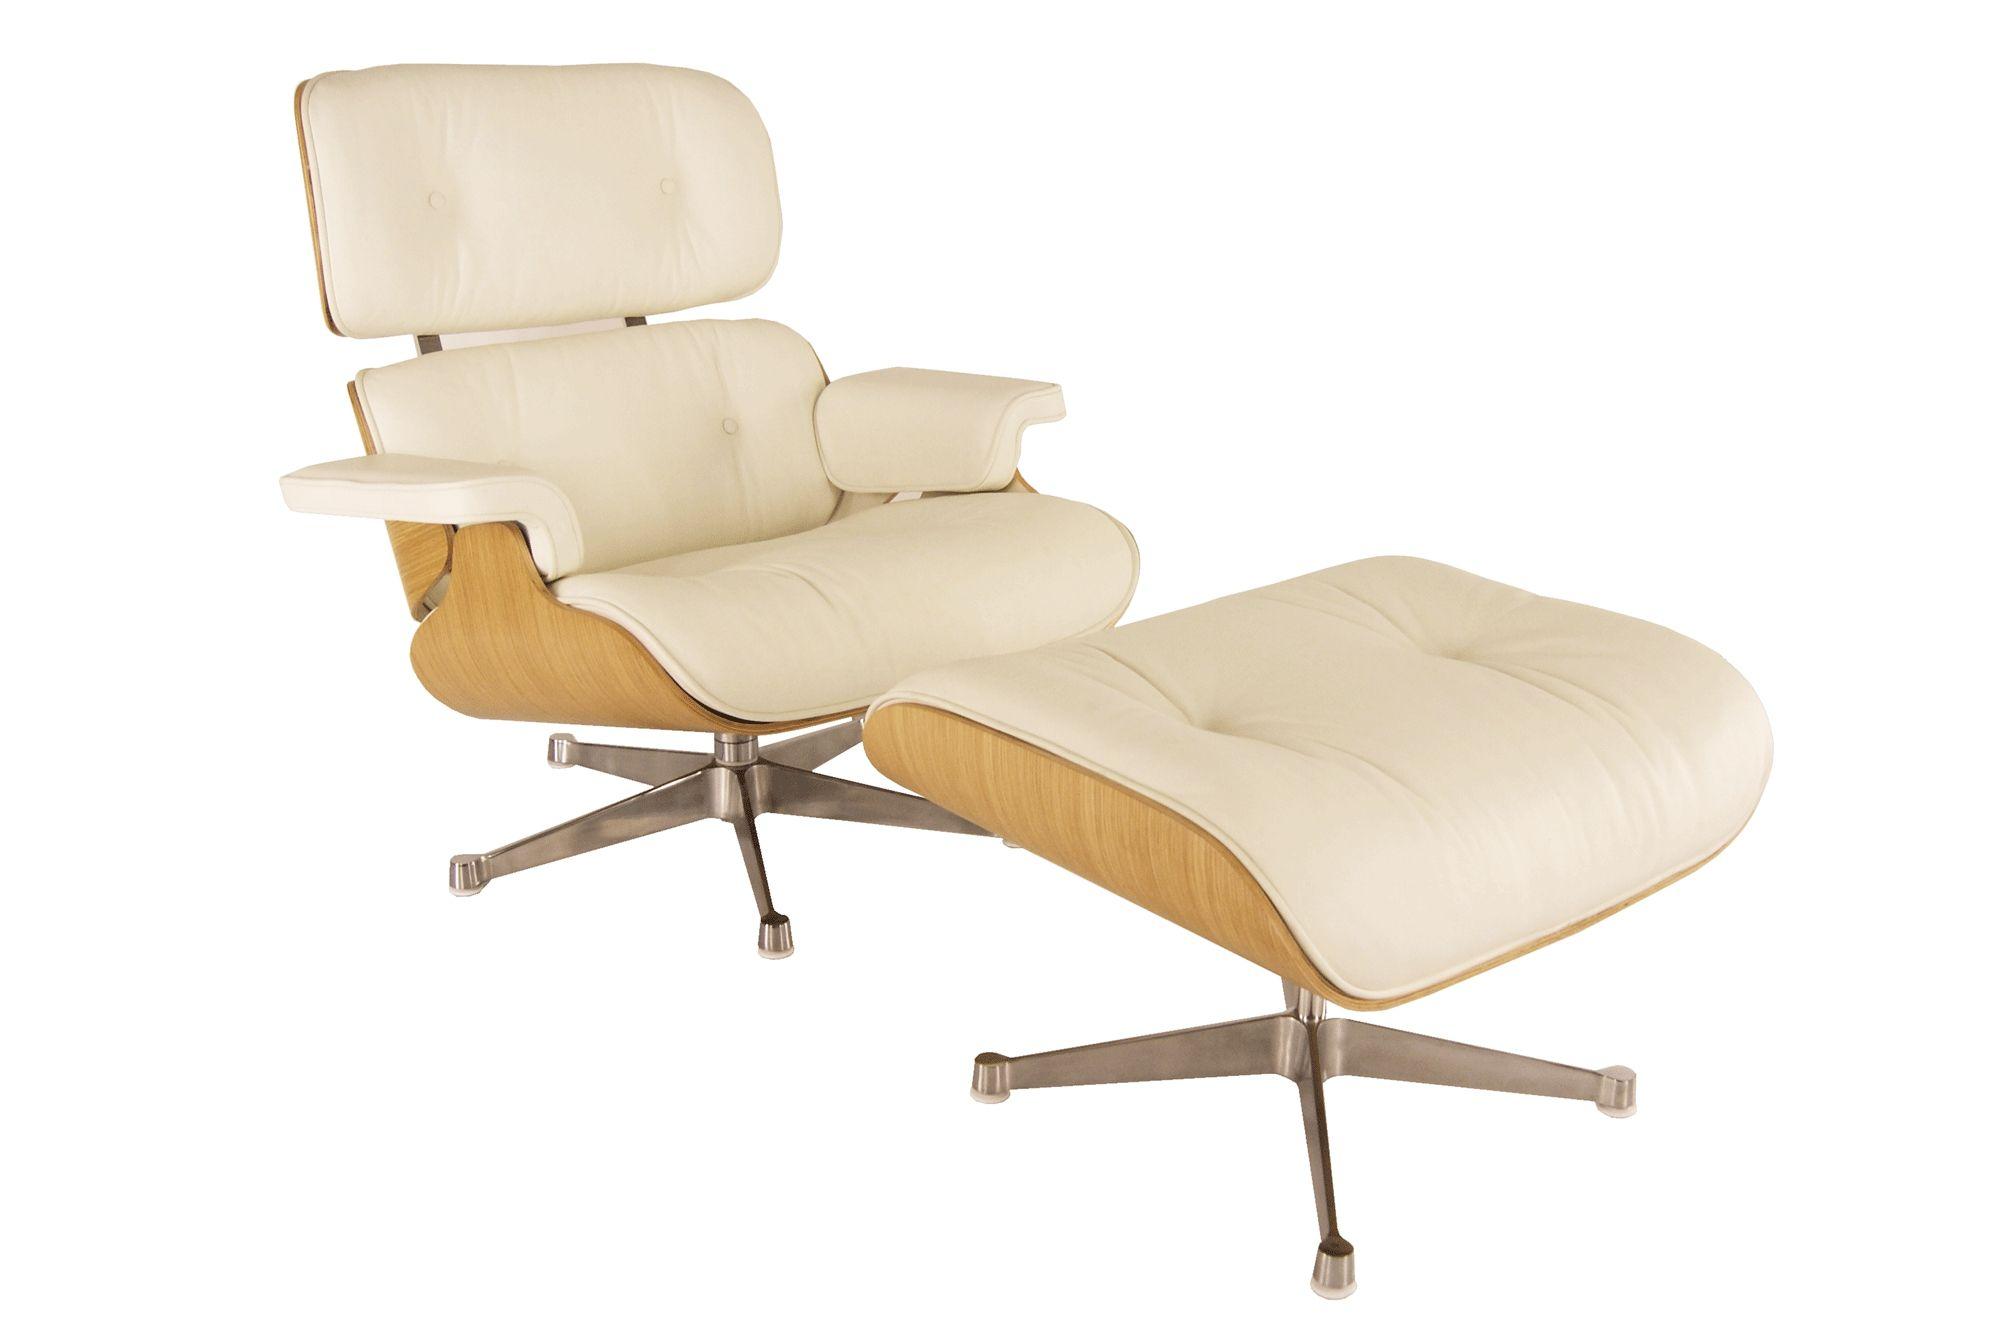 Web style lounge chair productcreationlabs pinterest